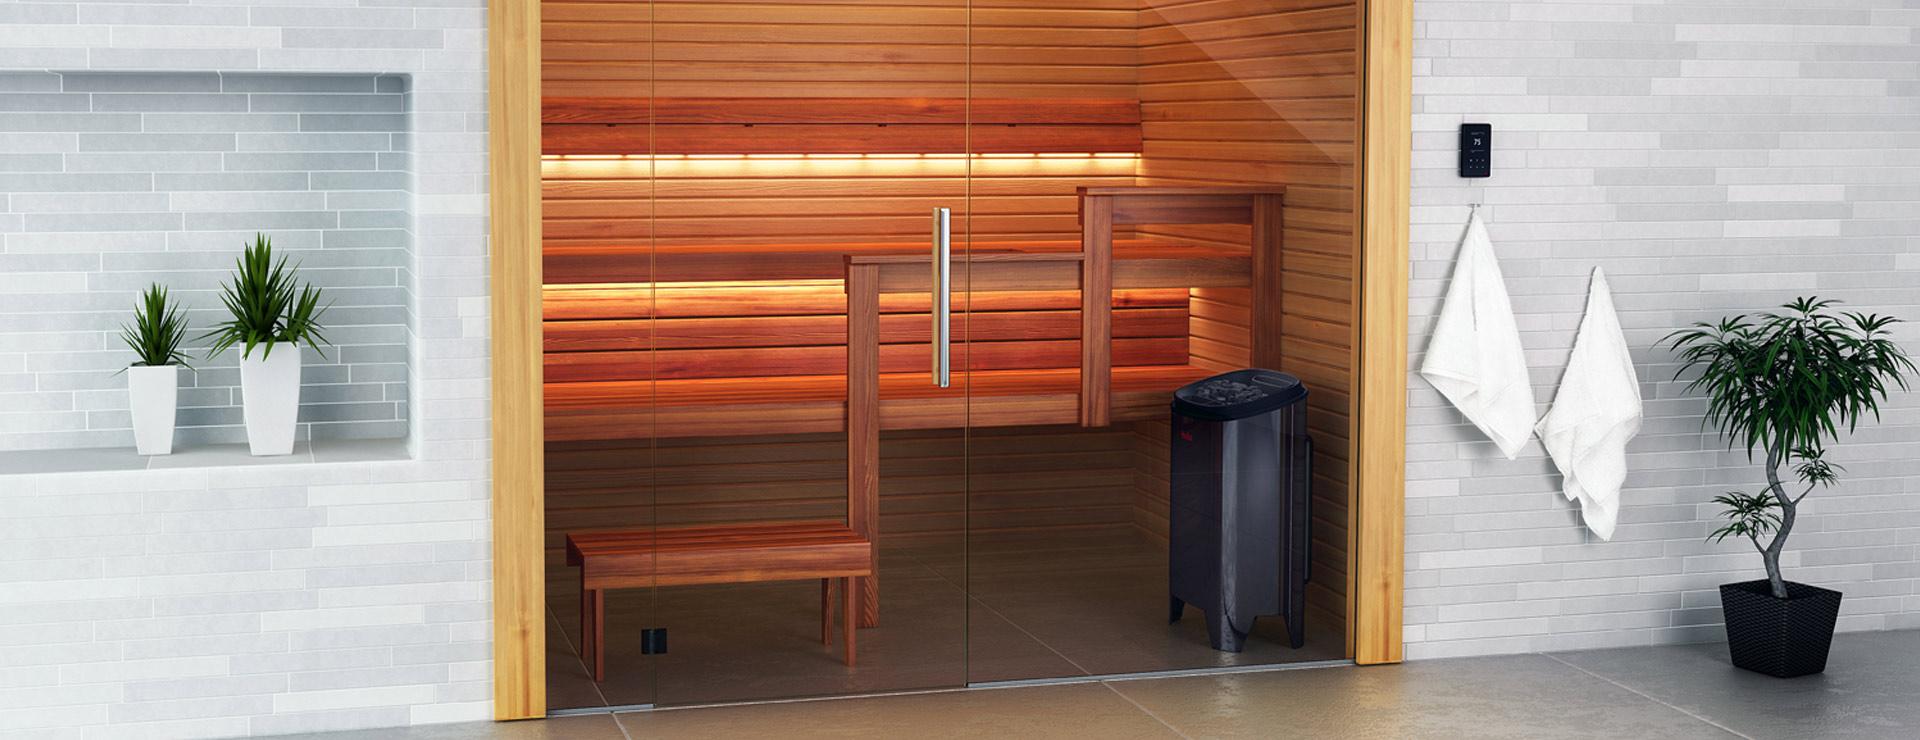 Sauna Kassel